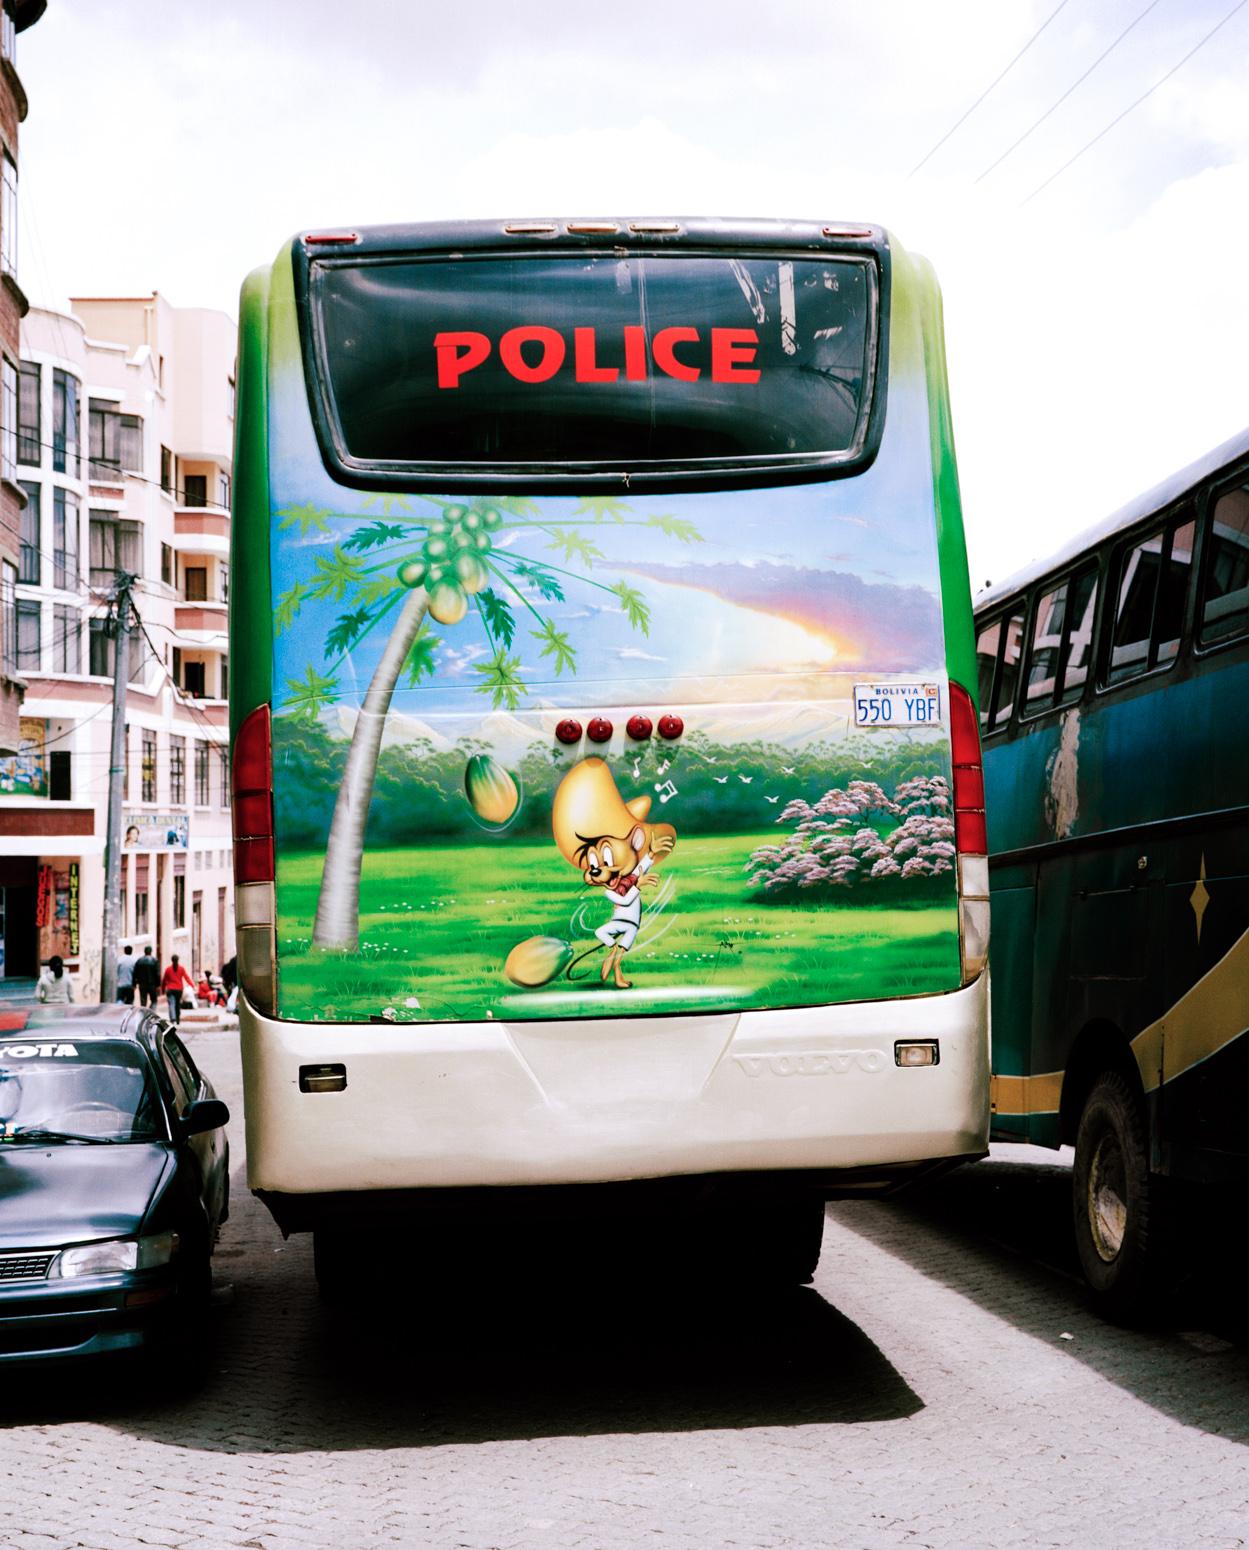 Daniel_Hofer_Bolivian_Busses_195_04_1550PX_WEB.jpg